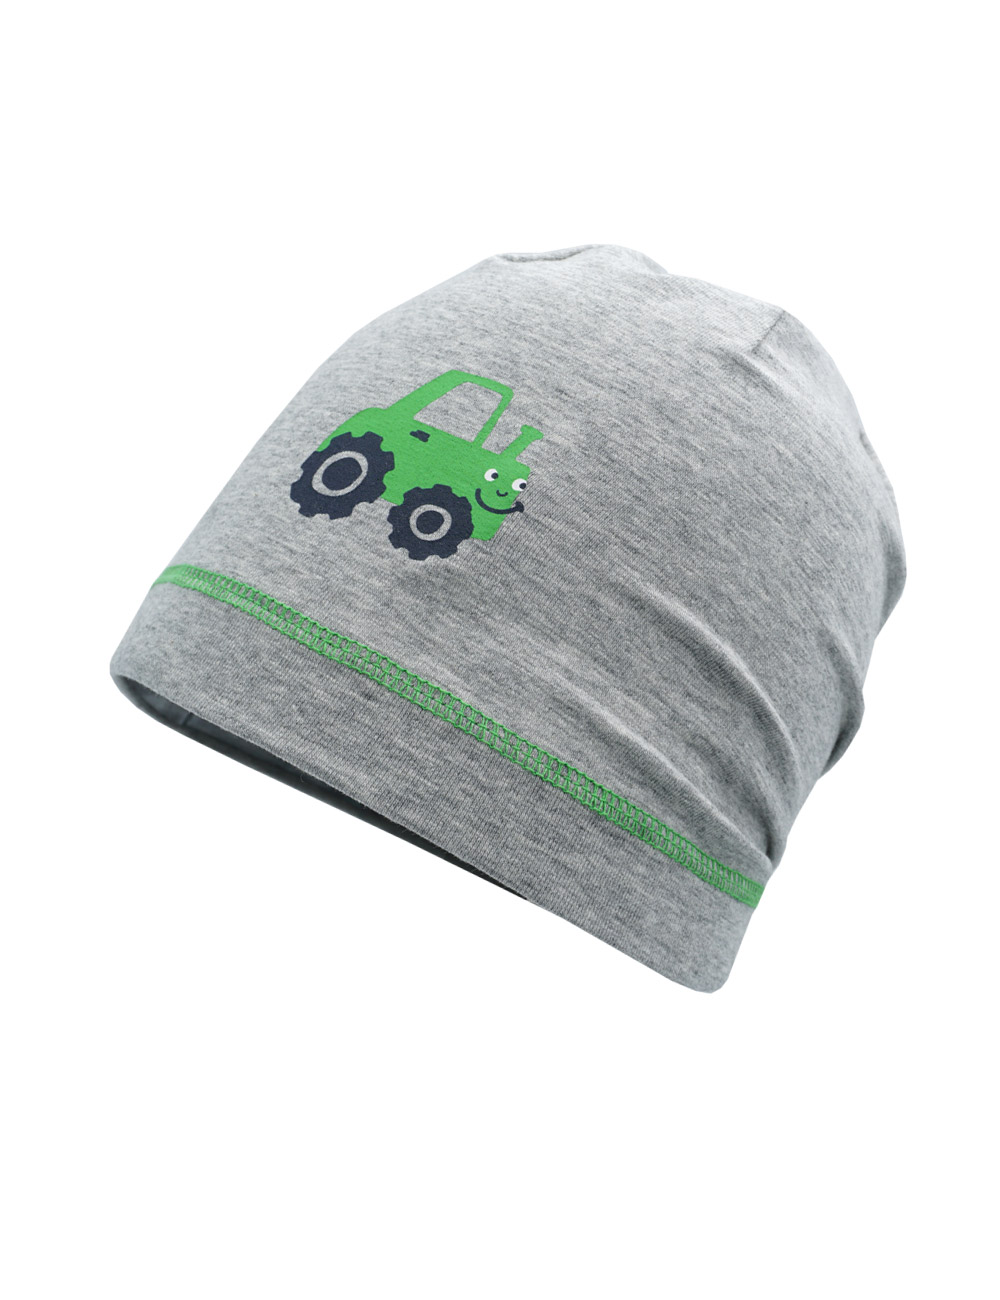 BOY-Beanie, tractor 47 Maximo. Farbe: graumeliert, Größe: 47/49